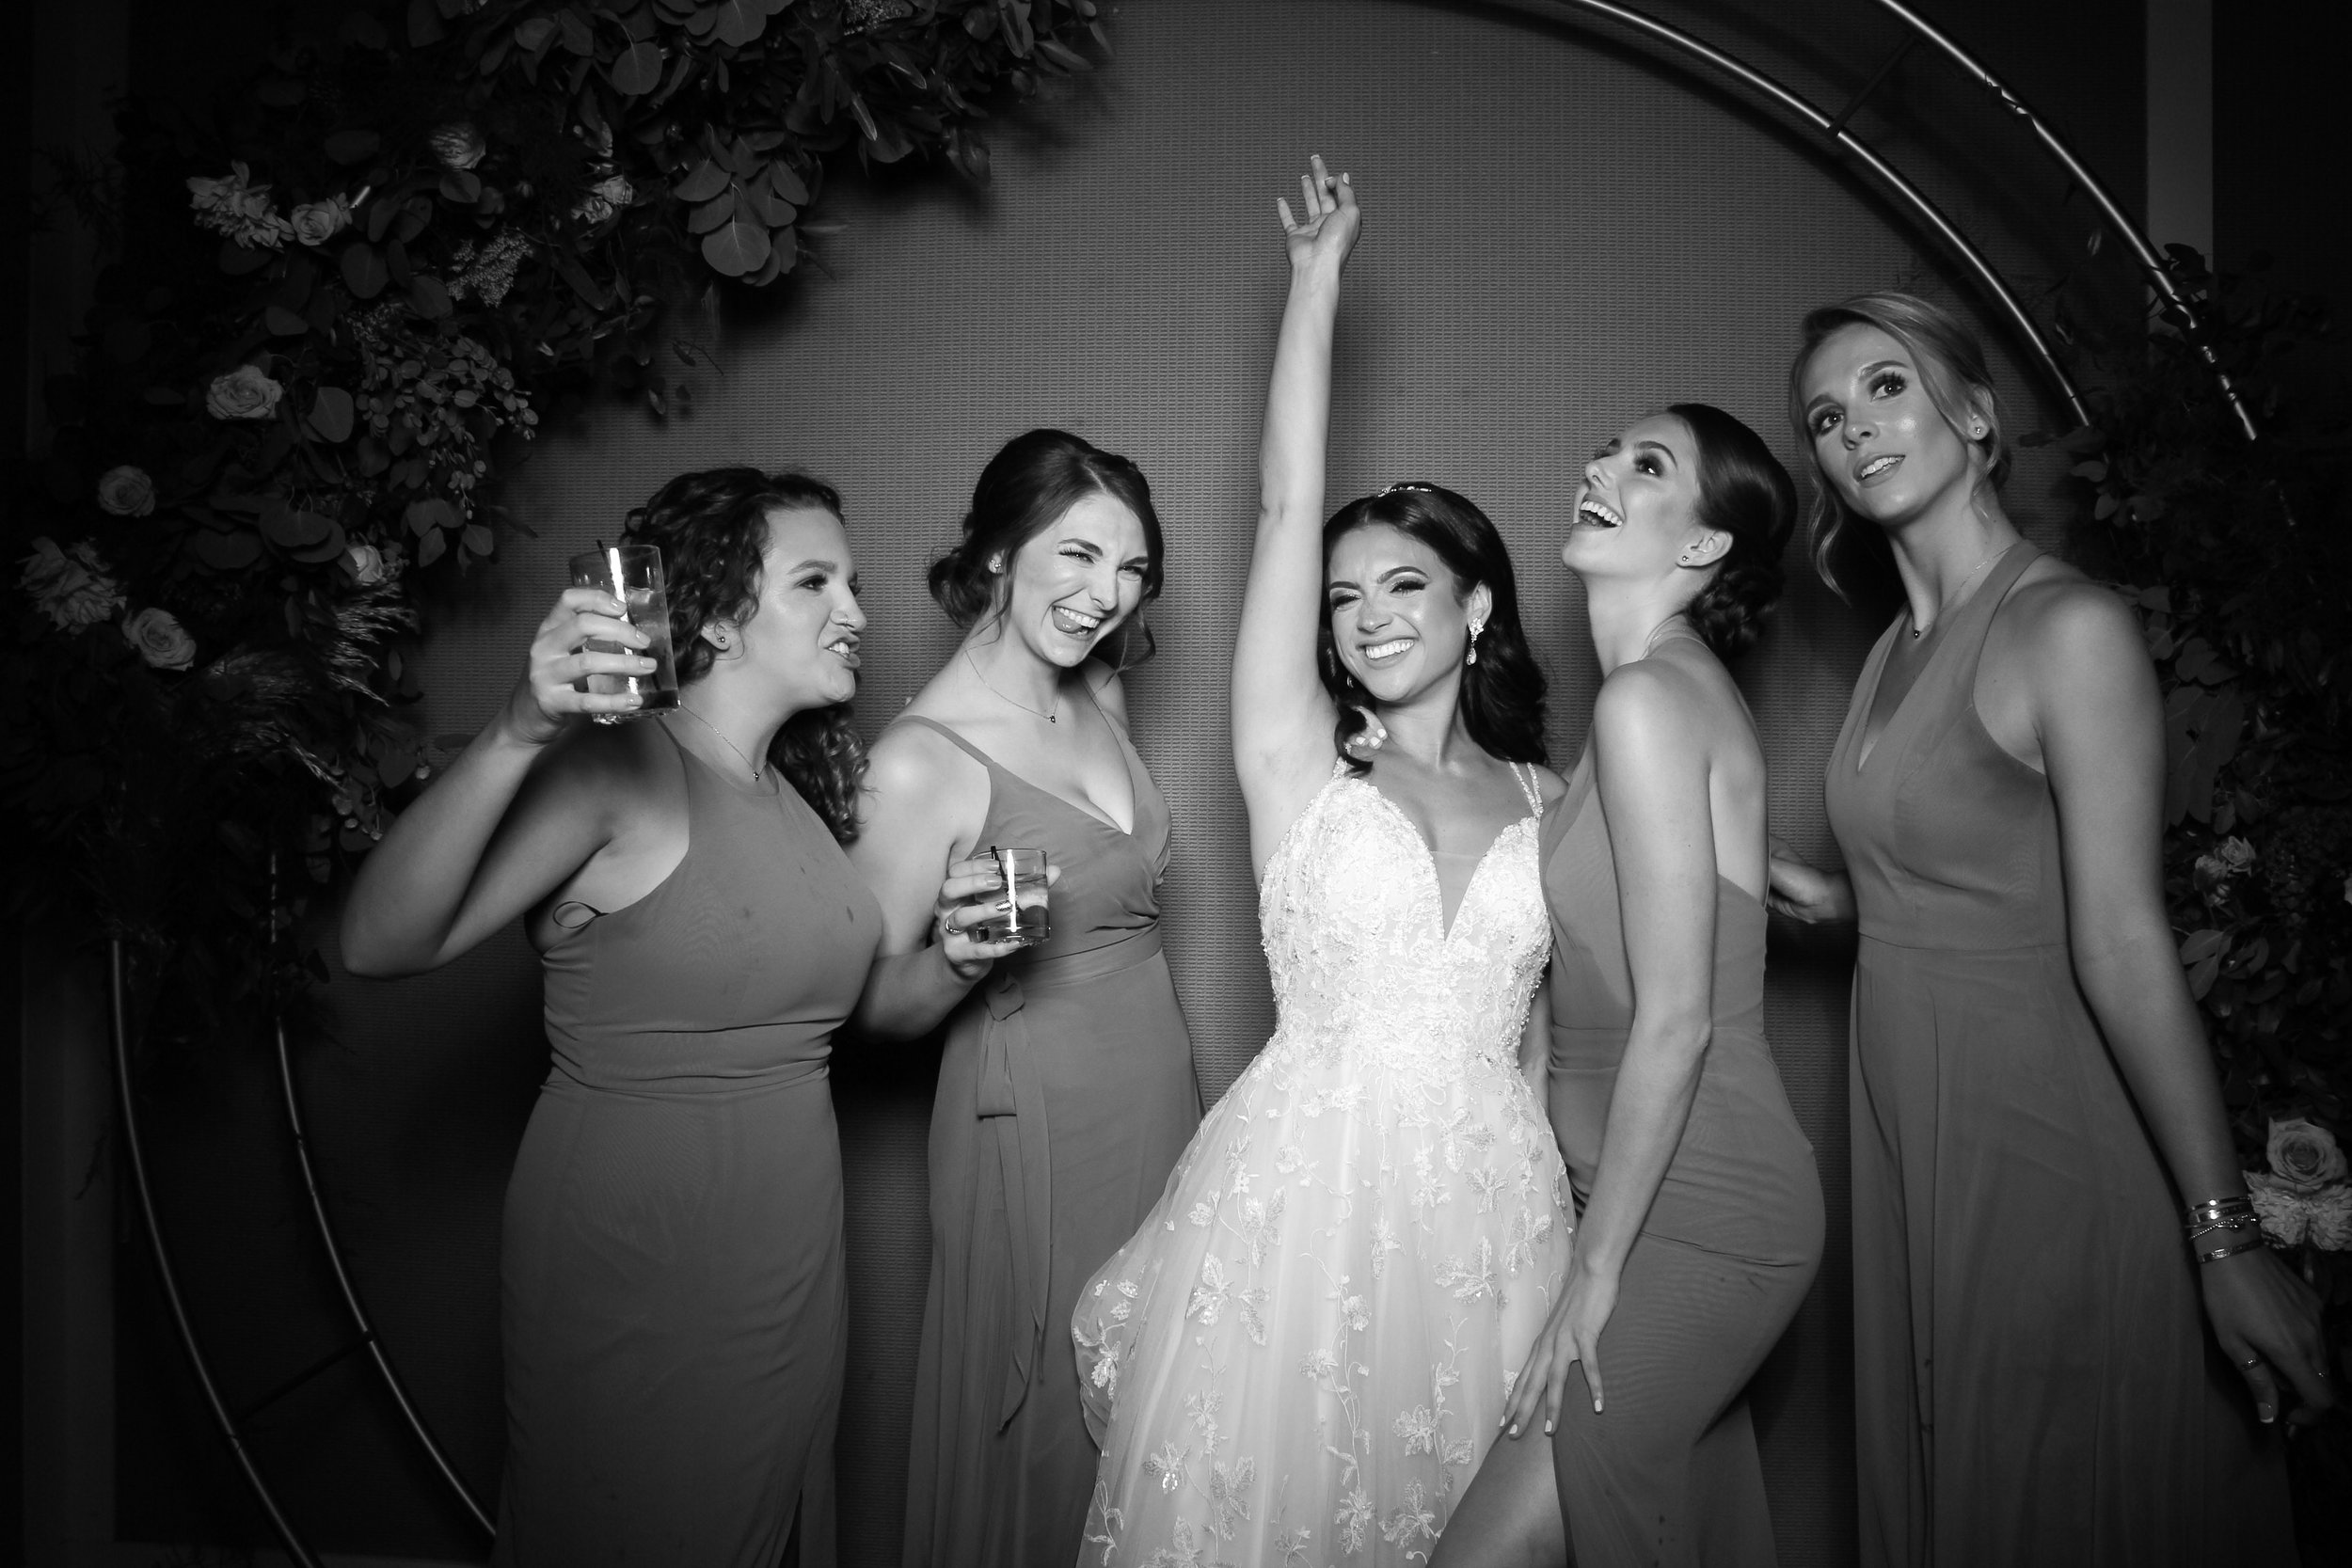 Metropolis_Ballroom_Wedding_Arlington_Heights_Photo_Booth_10.jpg